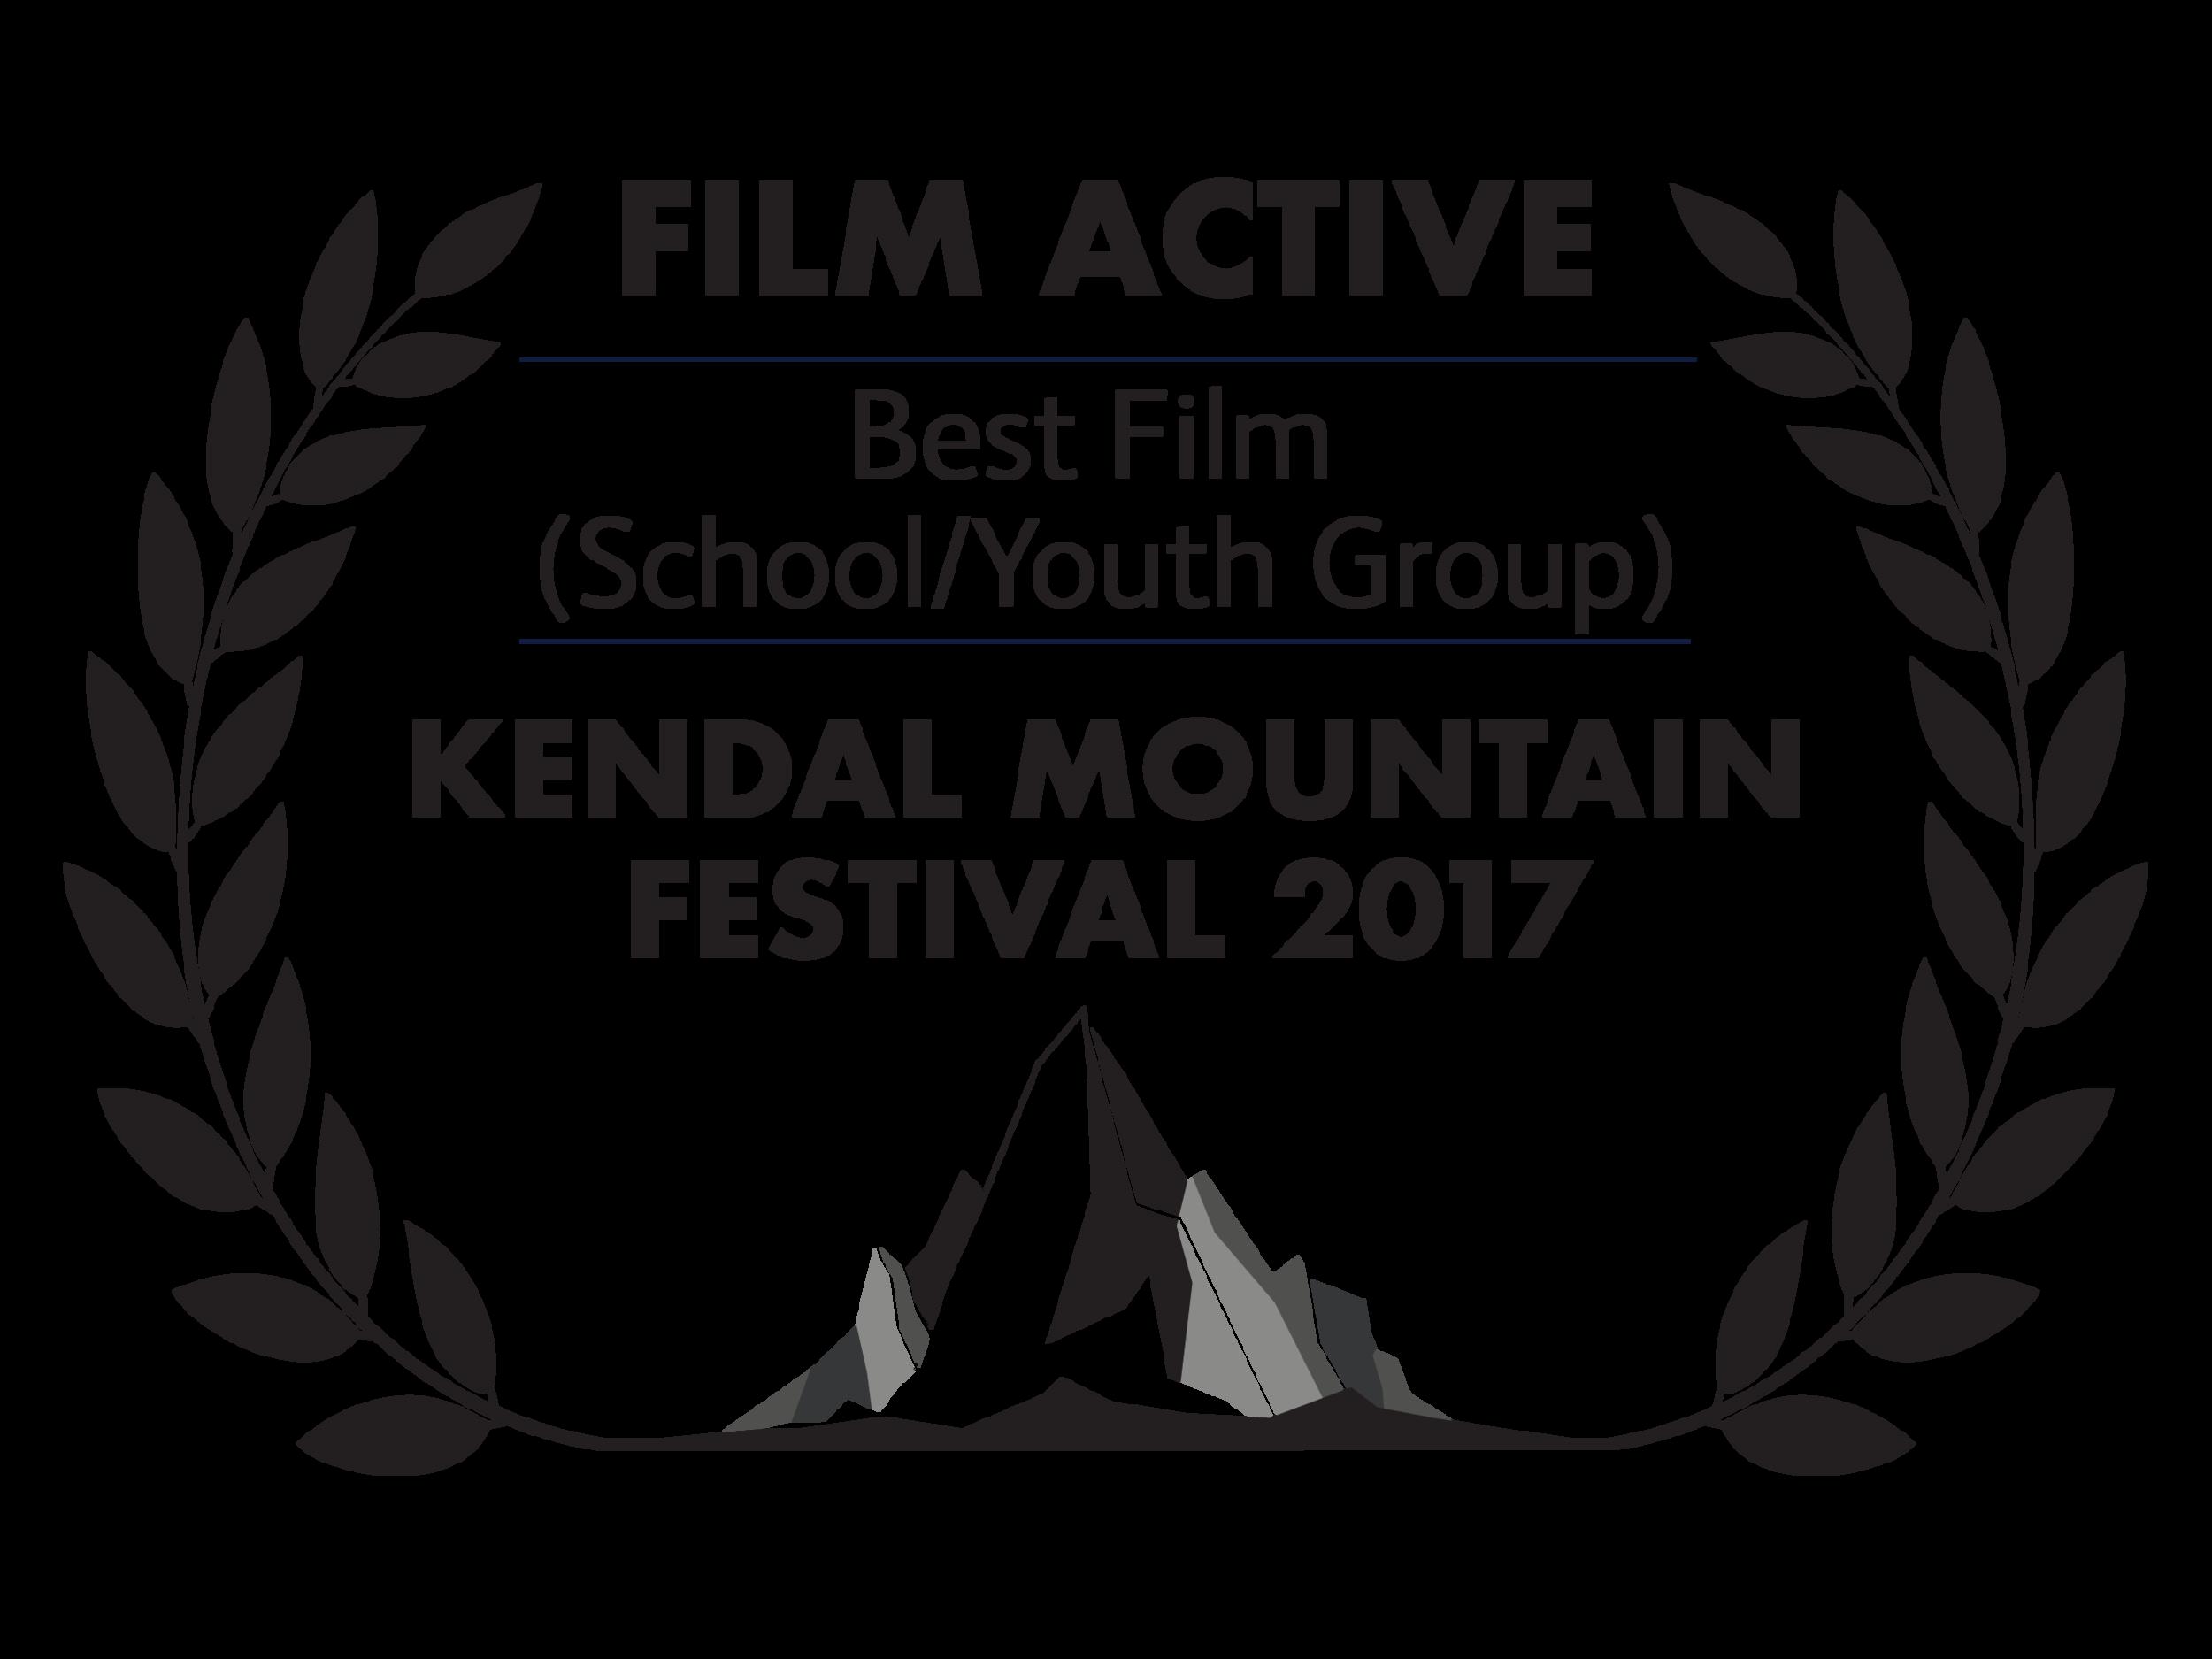 KMF LAURELS MASTER NEW 2017 FILM ACTIVE-03.png